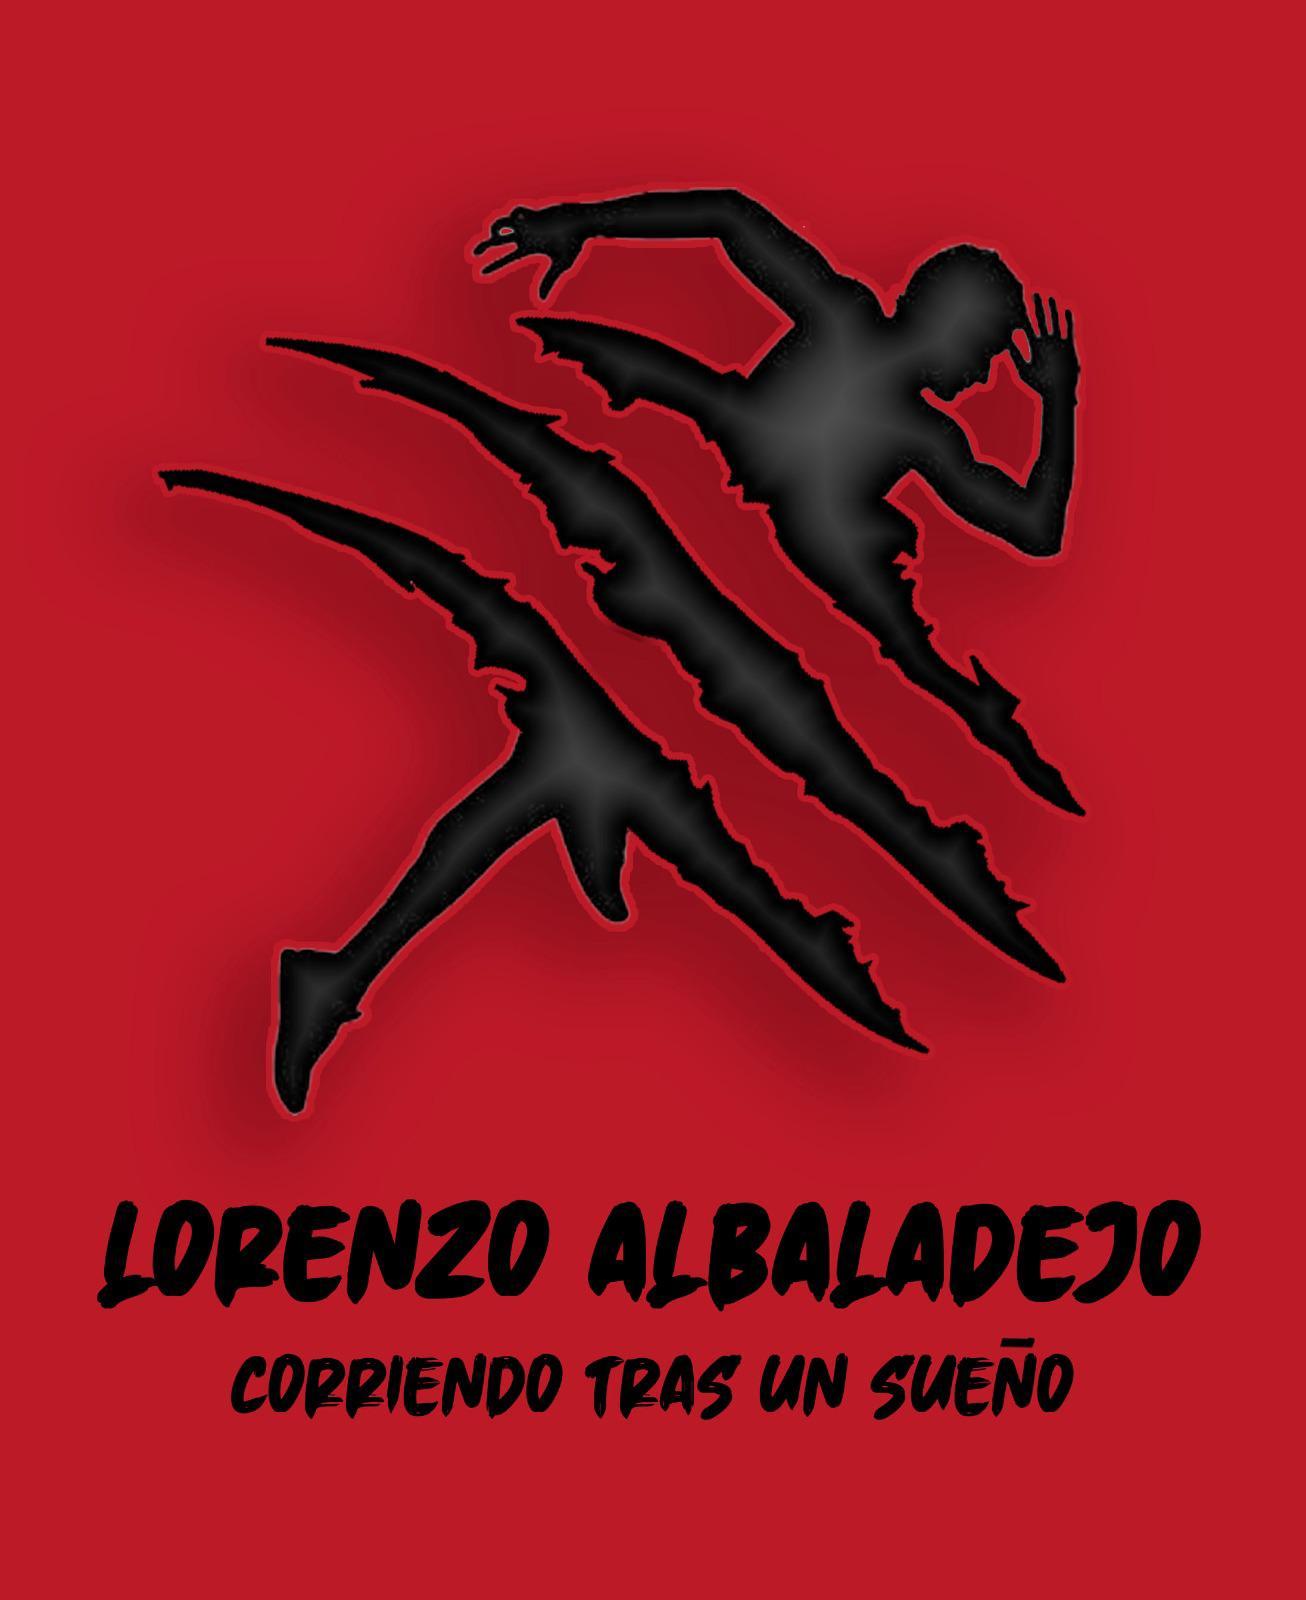 Lorenzo Albaladejo